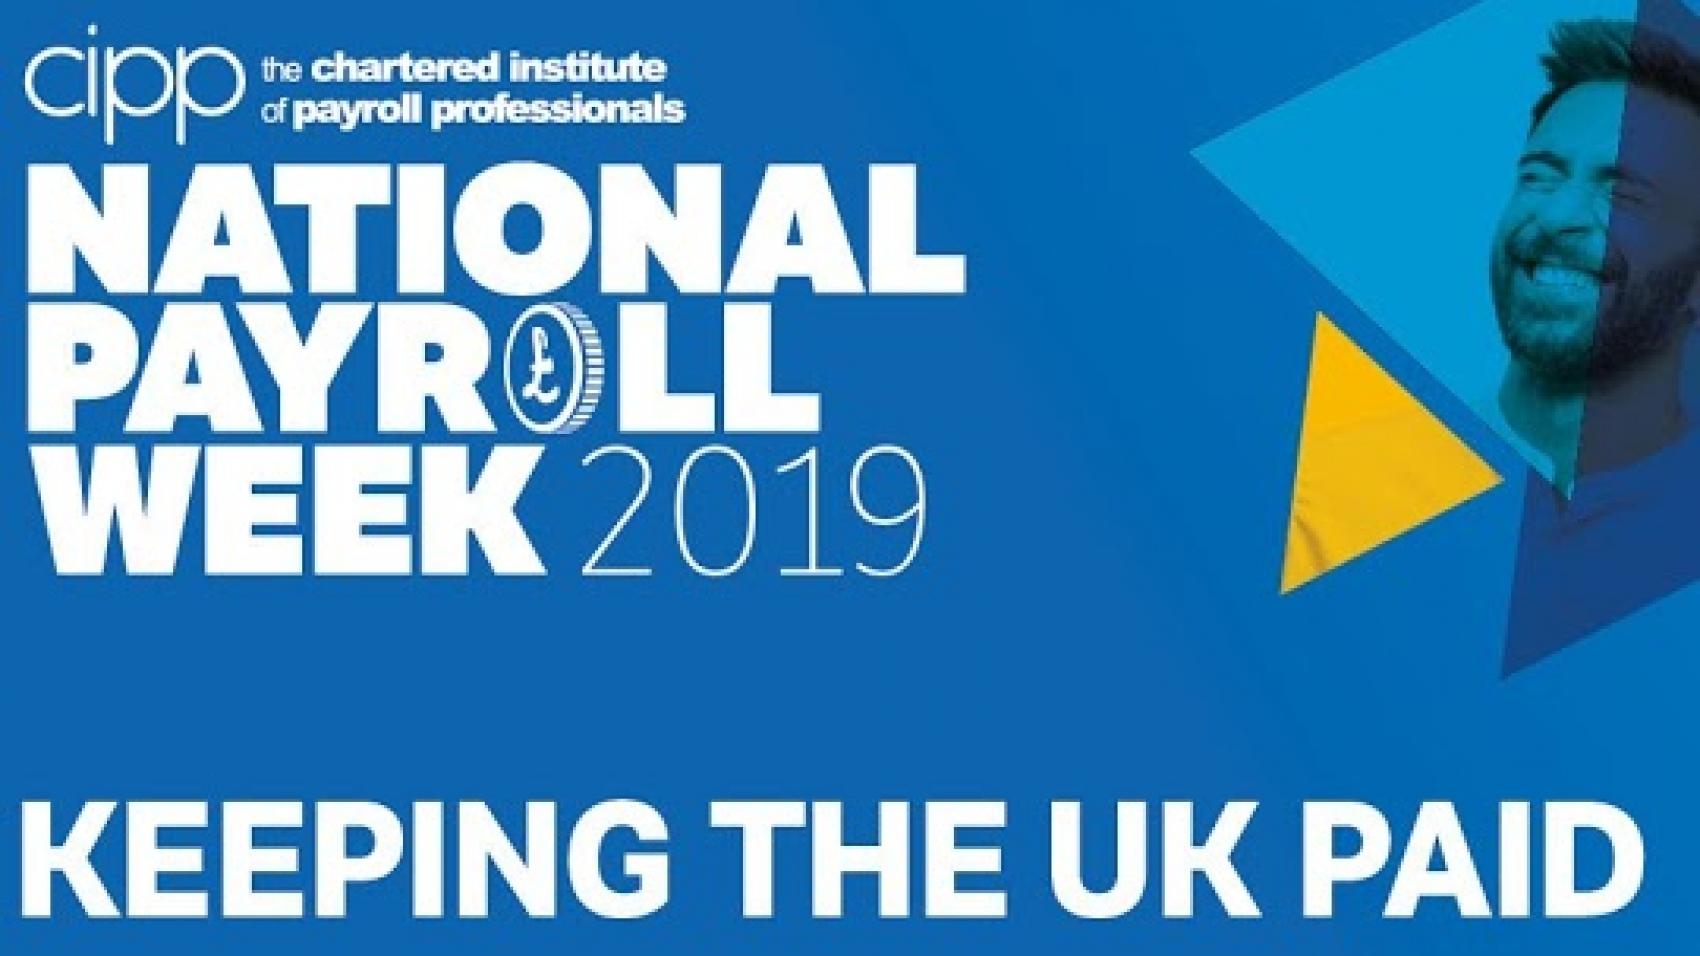 cipp-national-payroll-week-2019